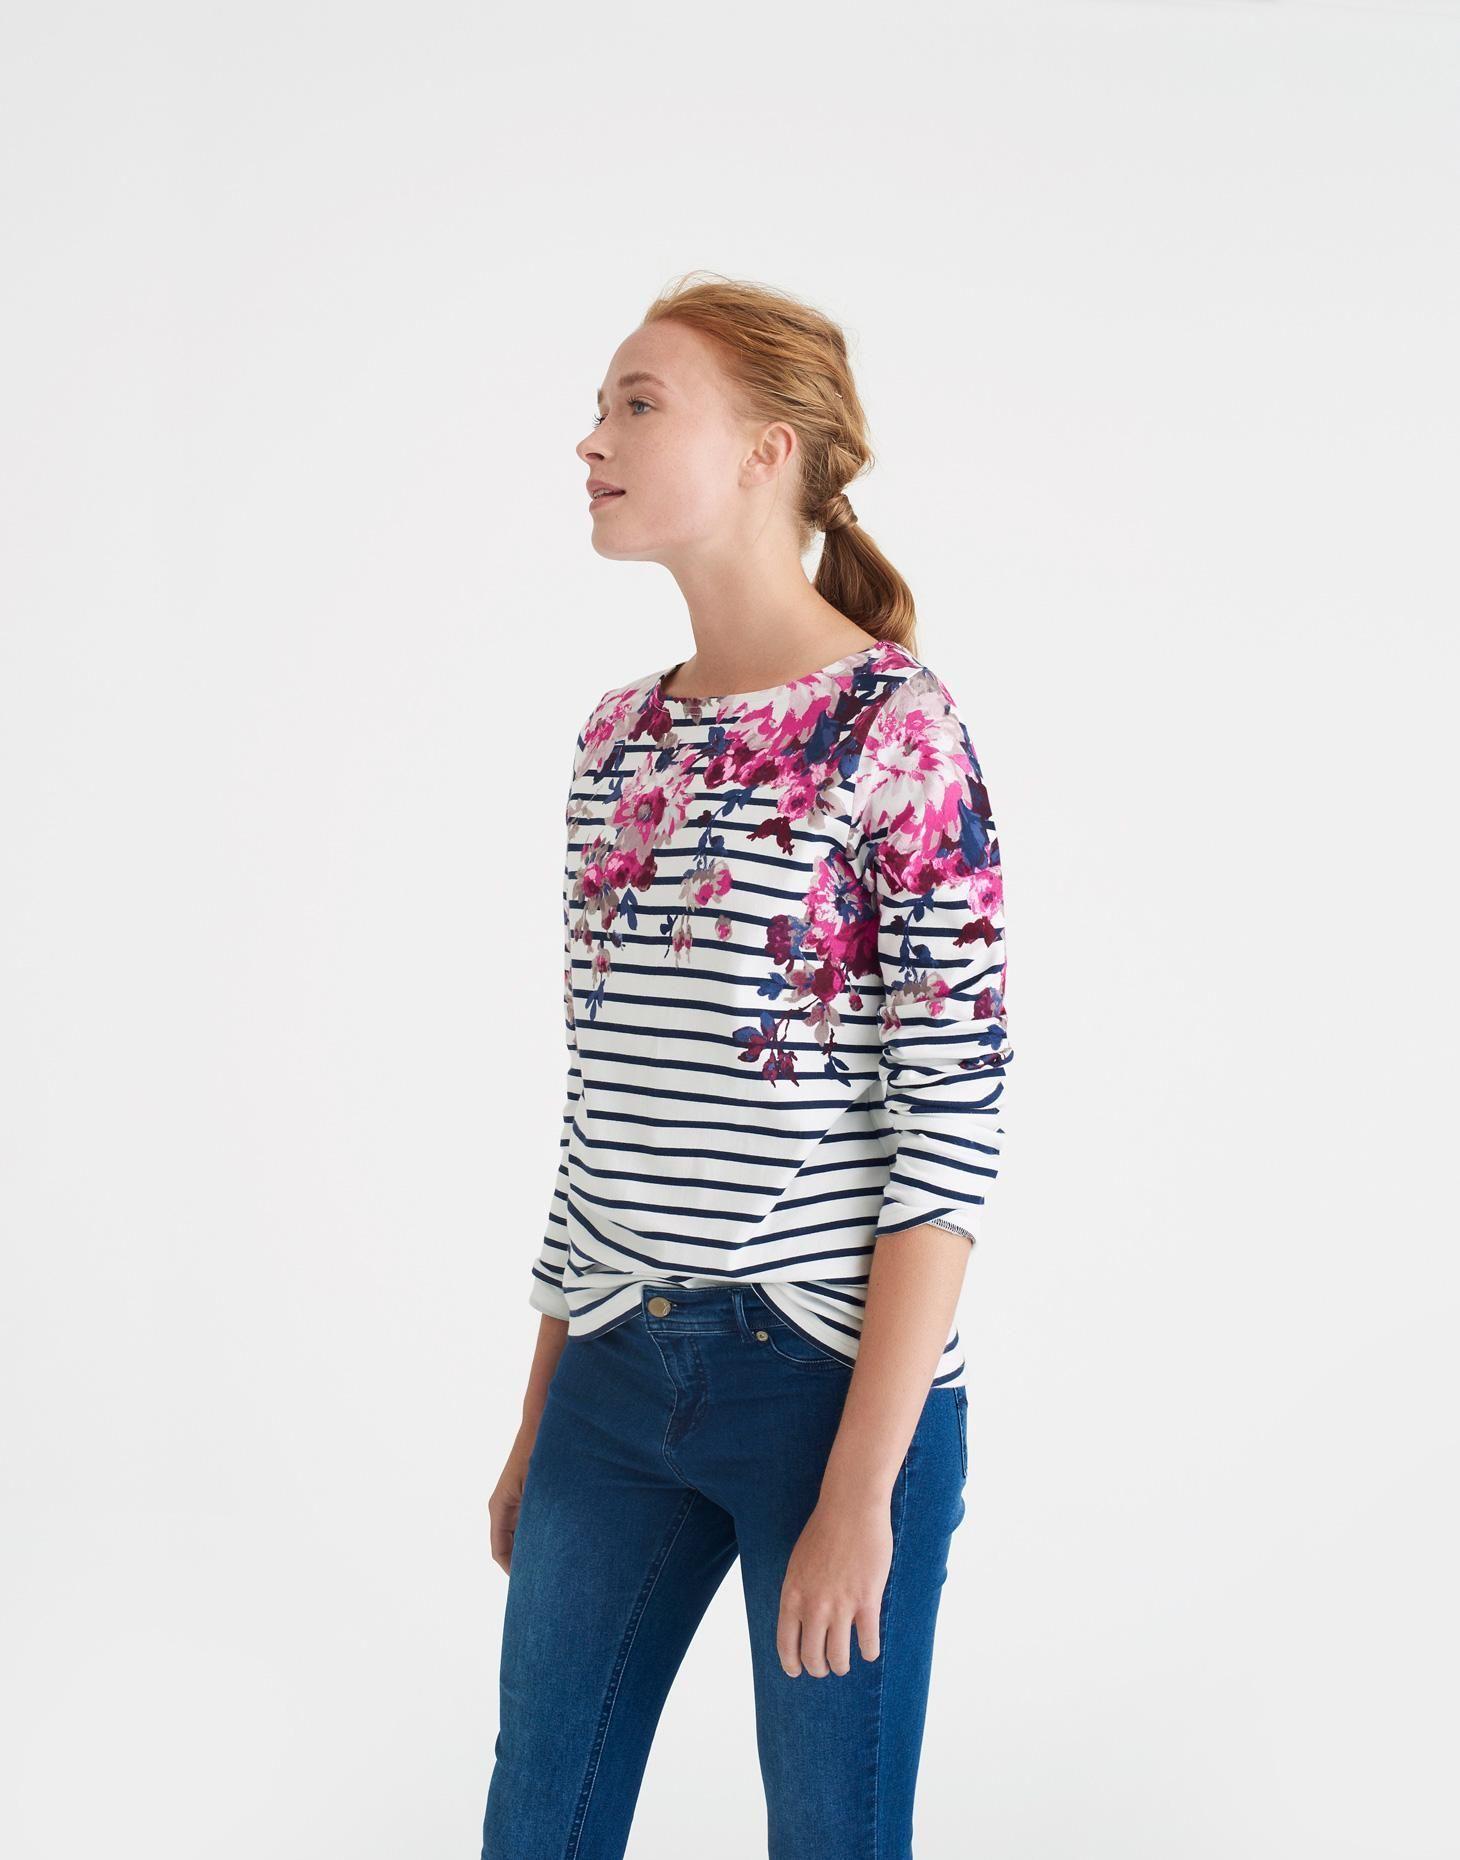 e0101f07e30d9 Harbour print Cream Floral Stripe Jersey Top